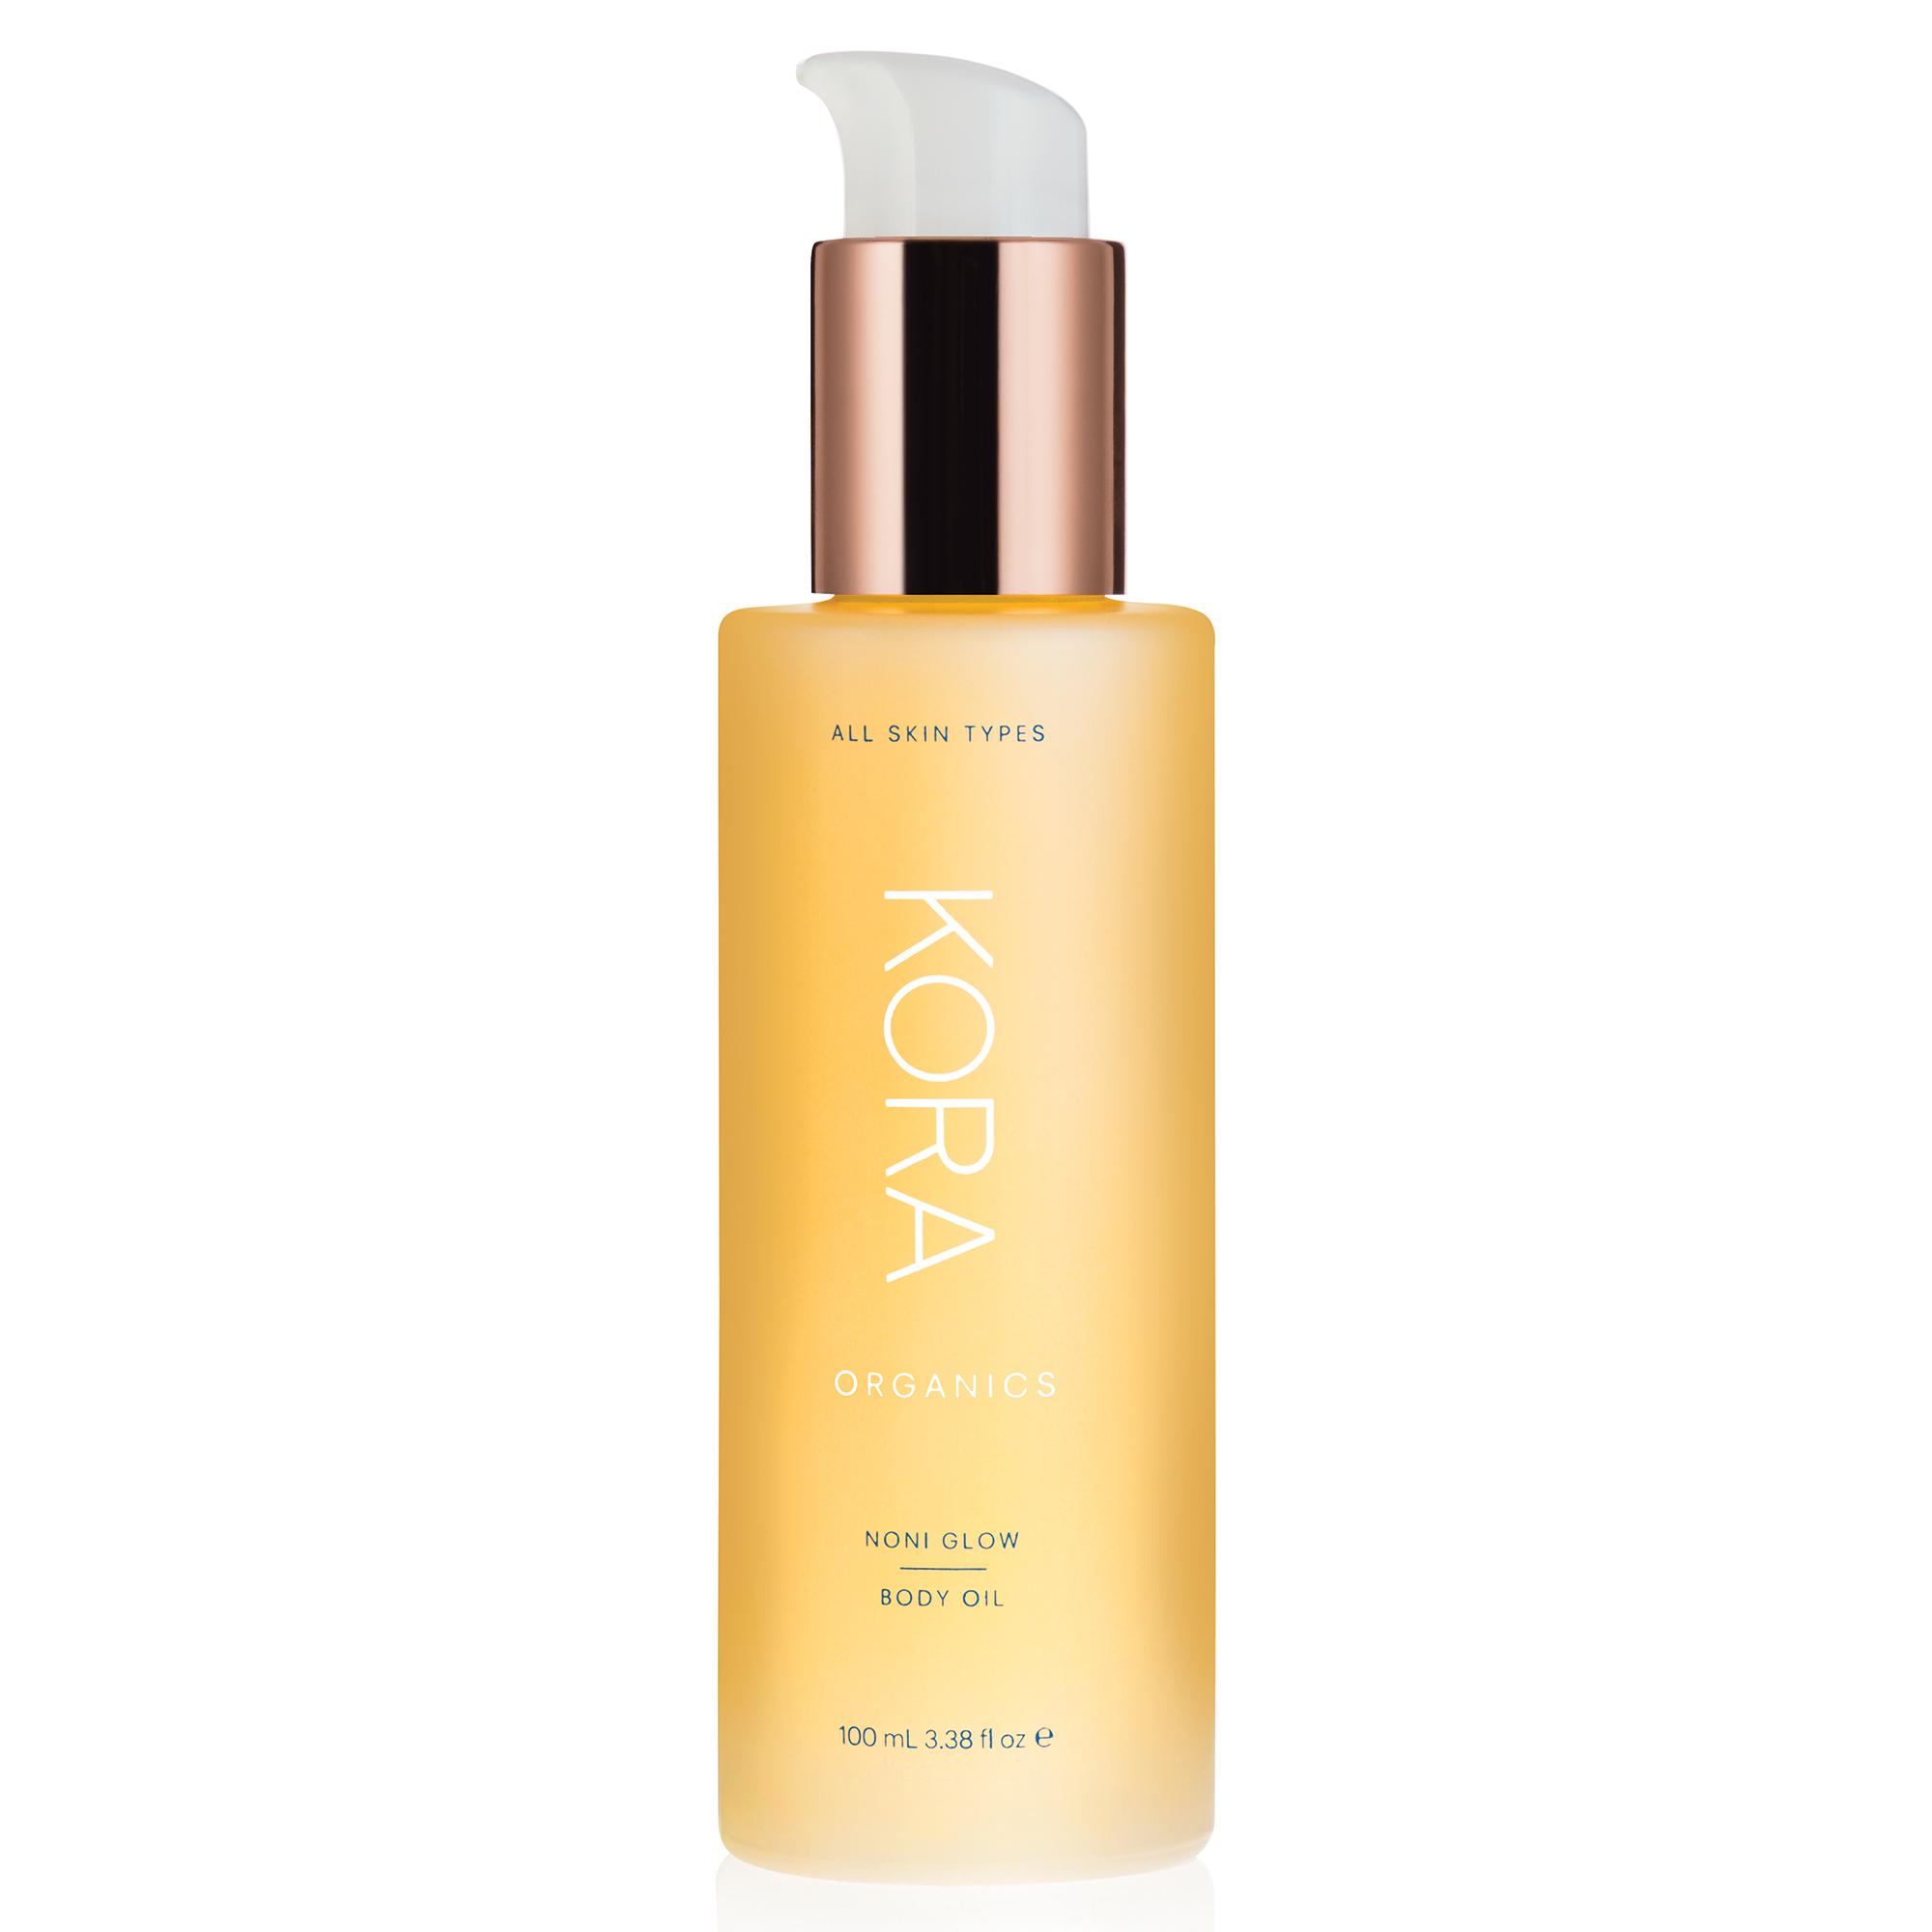 KORA Organics - Noni Glow Body Oil 100 ml